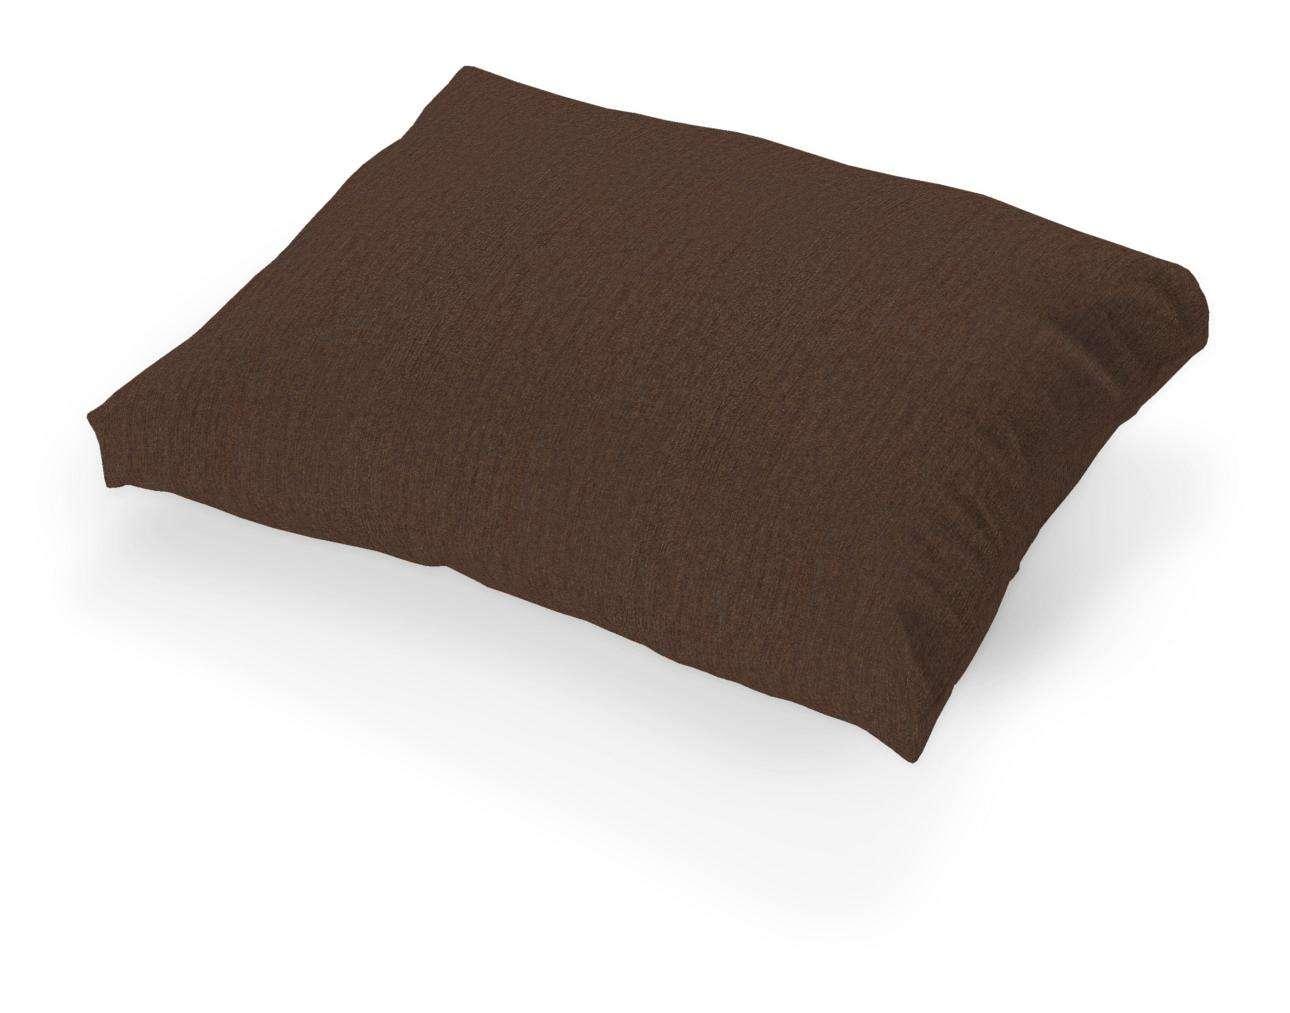 Tylösand pagalvėlės užvalkalas Tylösand pagalvėlė kolekcijoje Chenille, audinys: 702-18